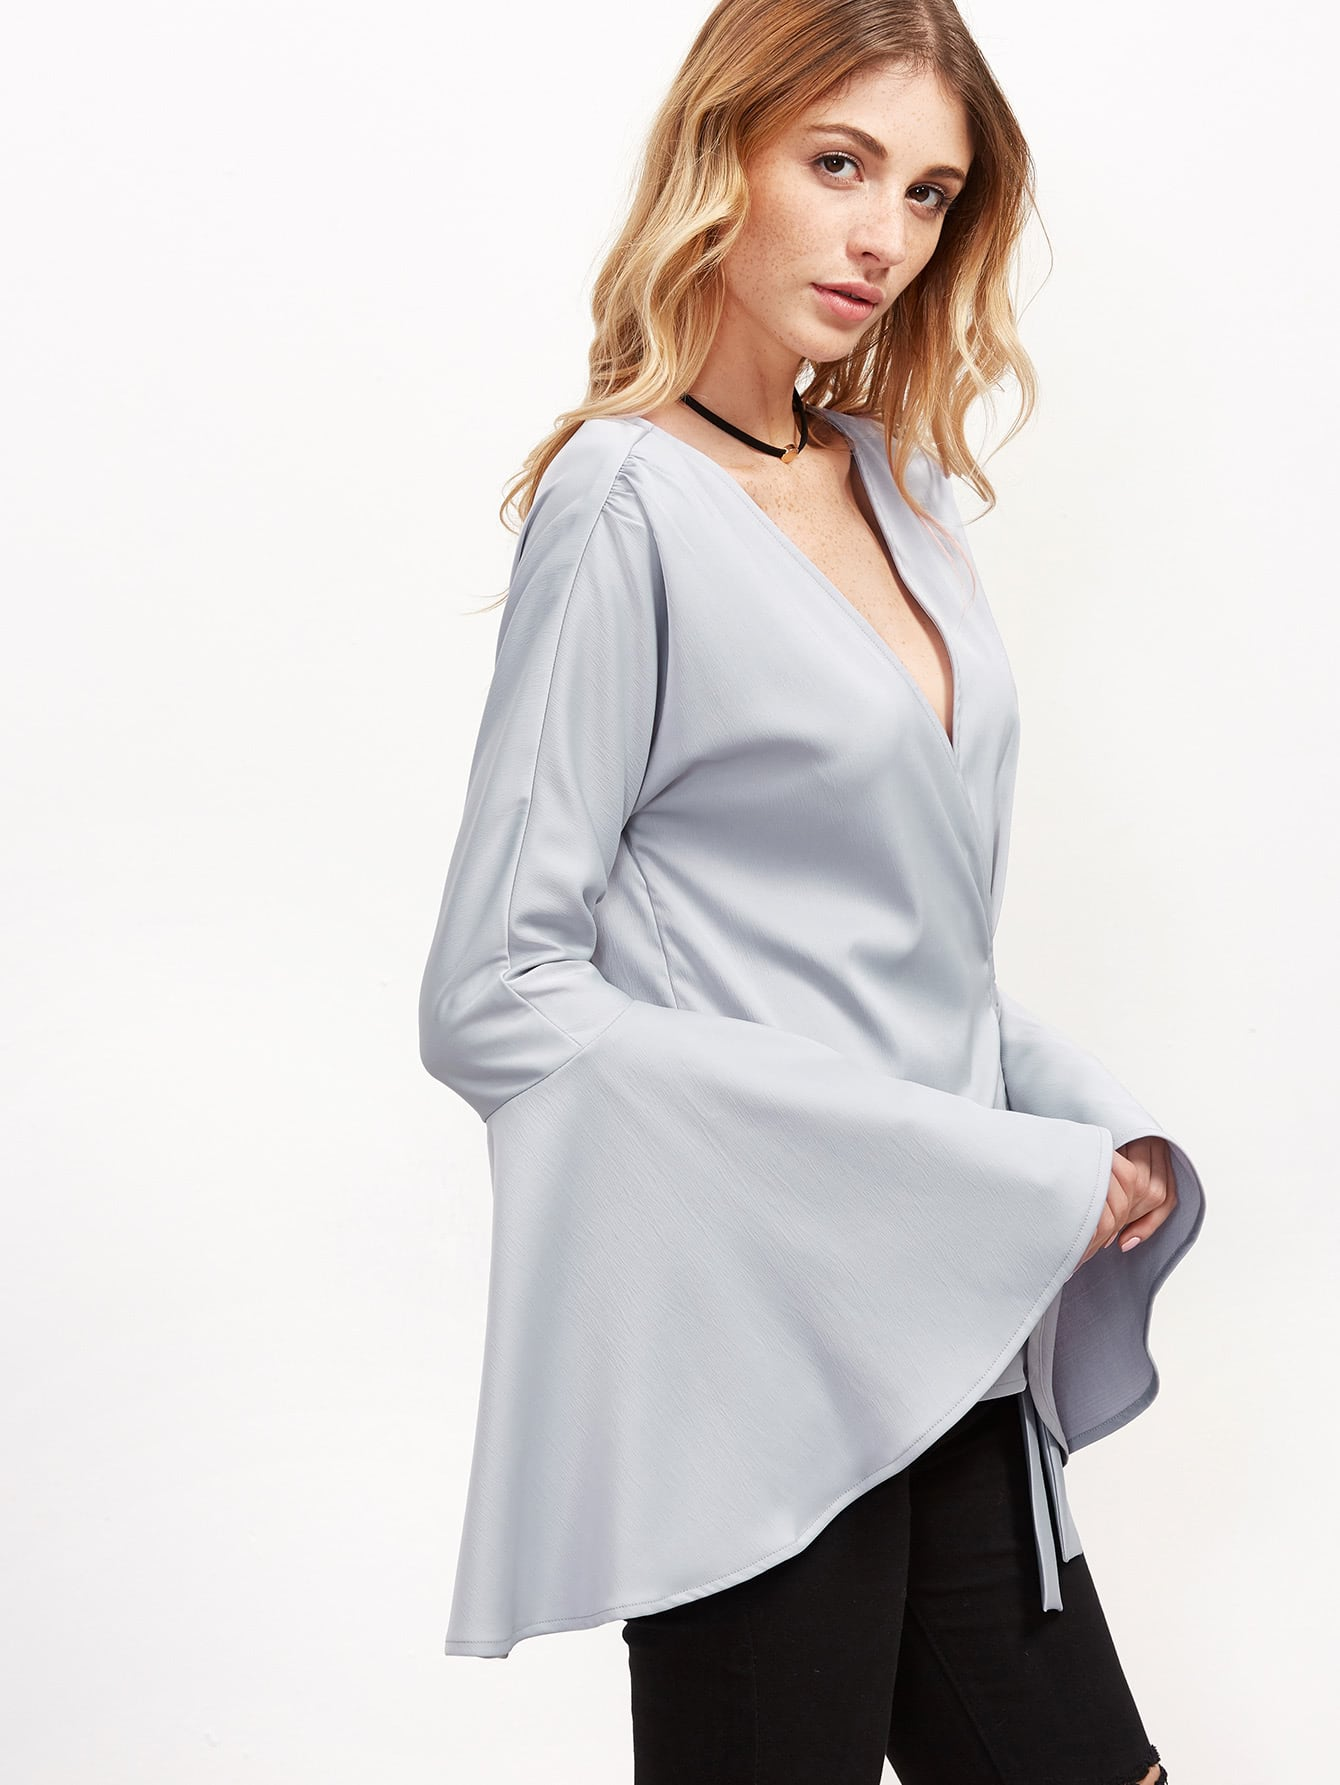 blouse161018707_2